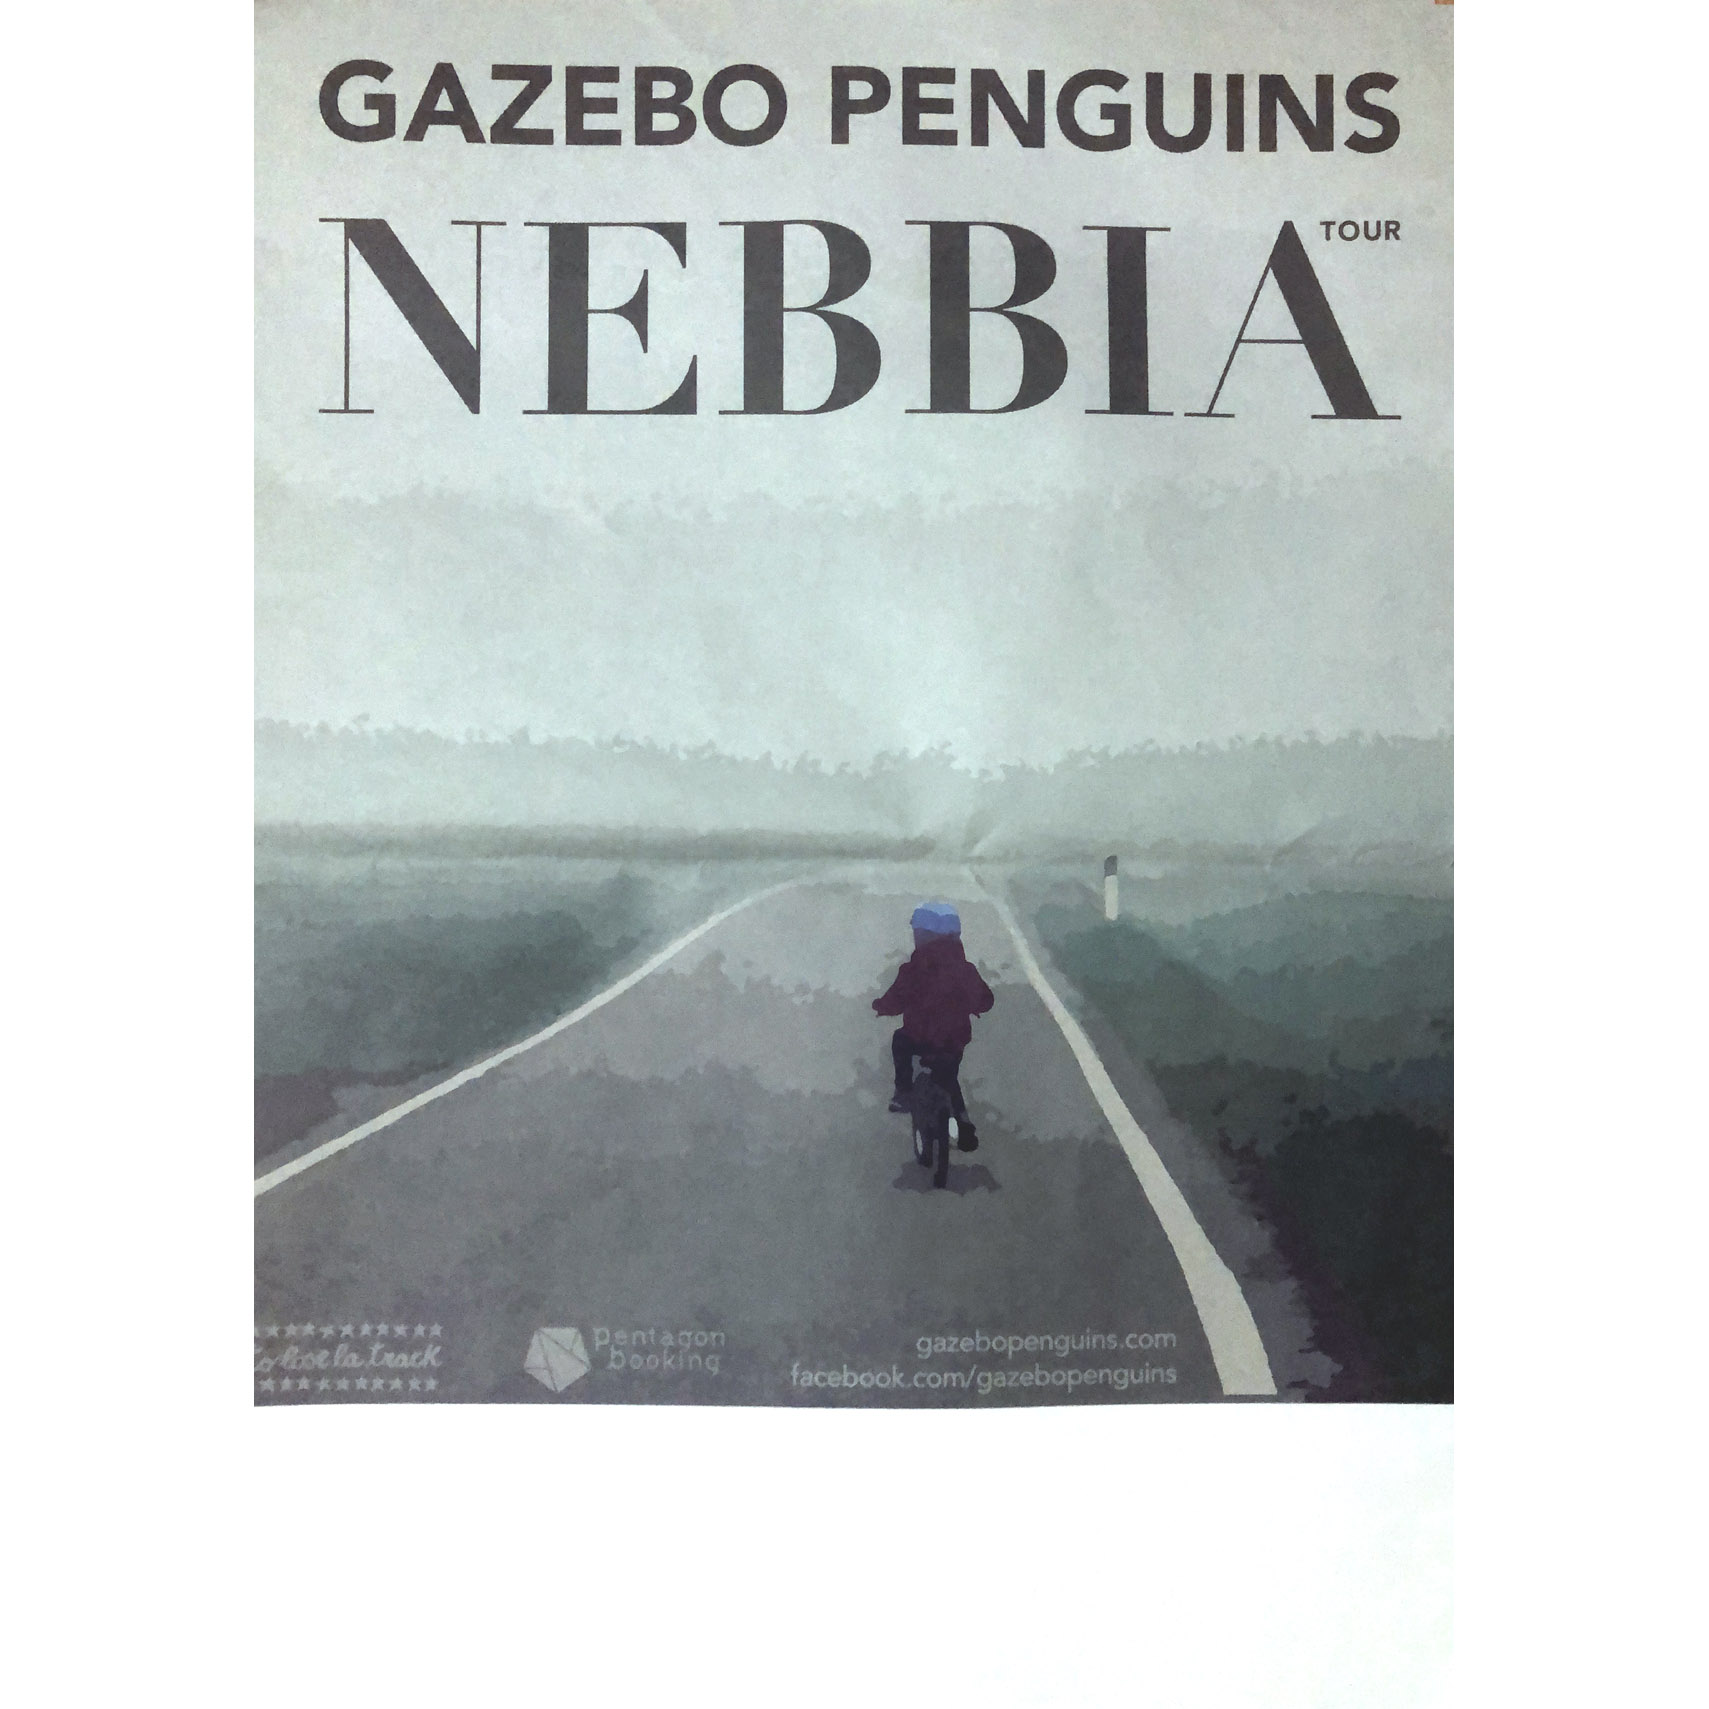 Gazebo Penguins - Nebbia 2017 tour poster